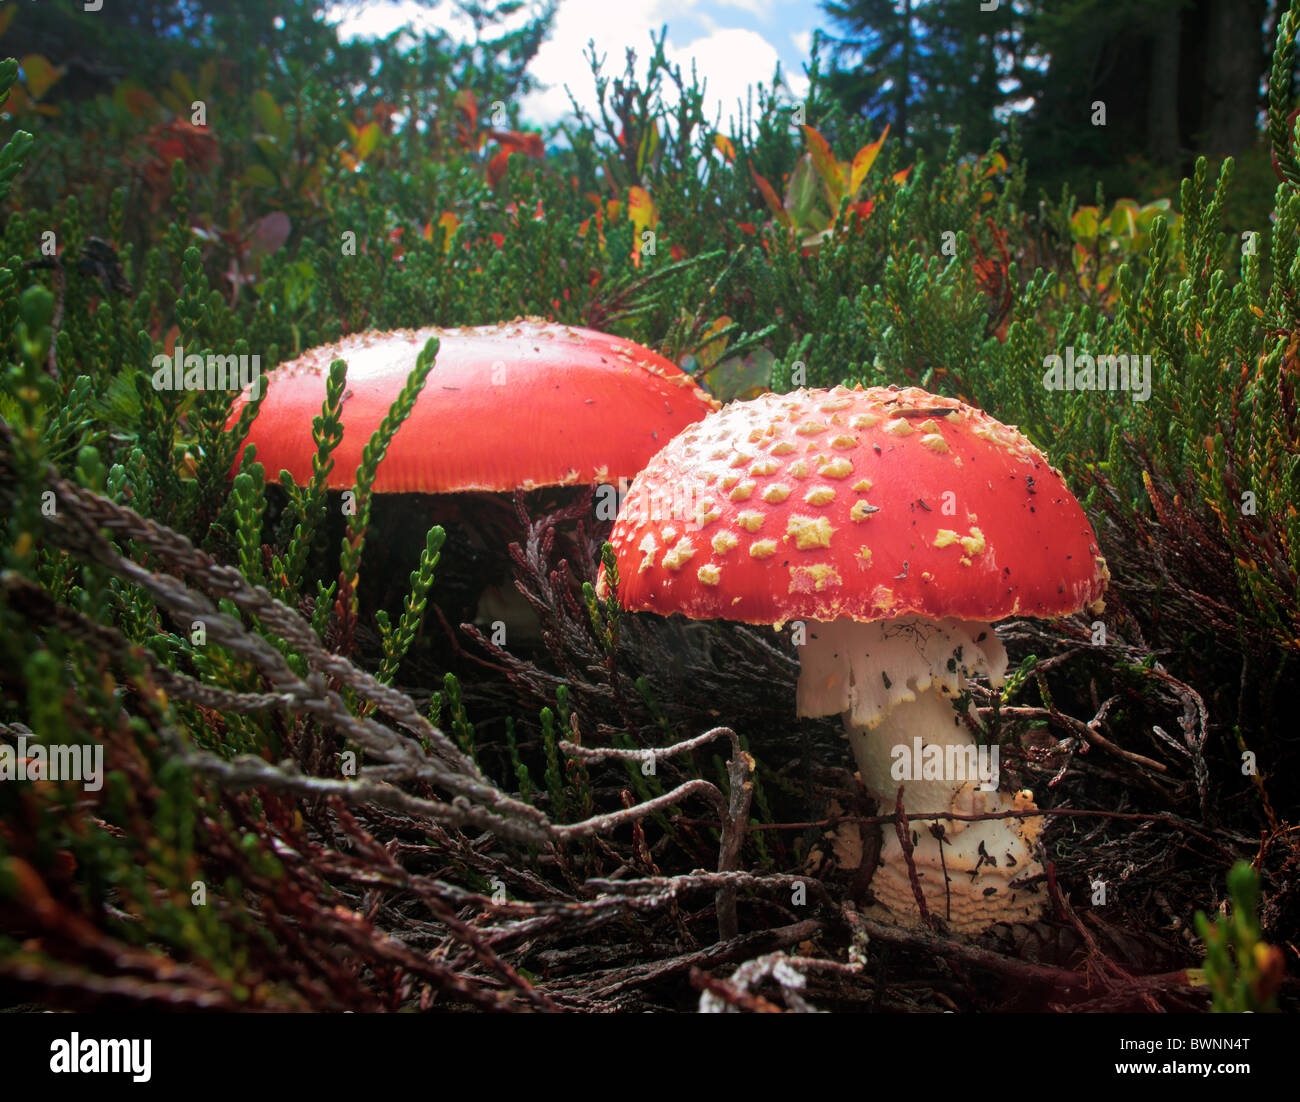 Fliegenpilz, Amanita Muscaria Pilze in der Mount Baker Wildnis im Staat Washington, USA Stockfoto